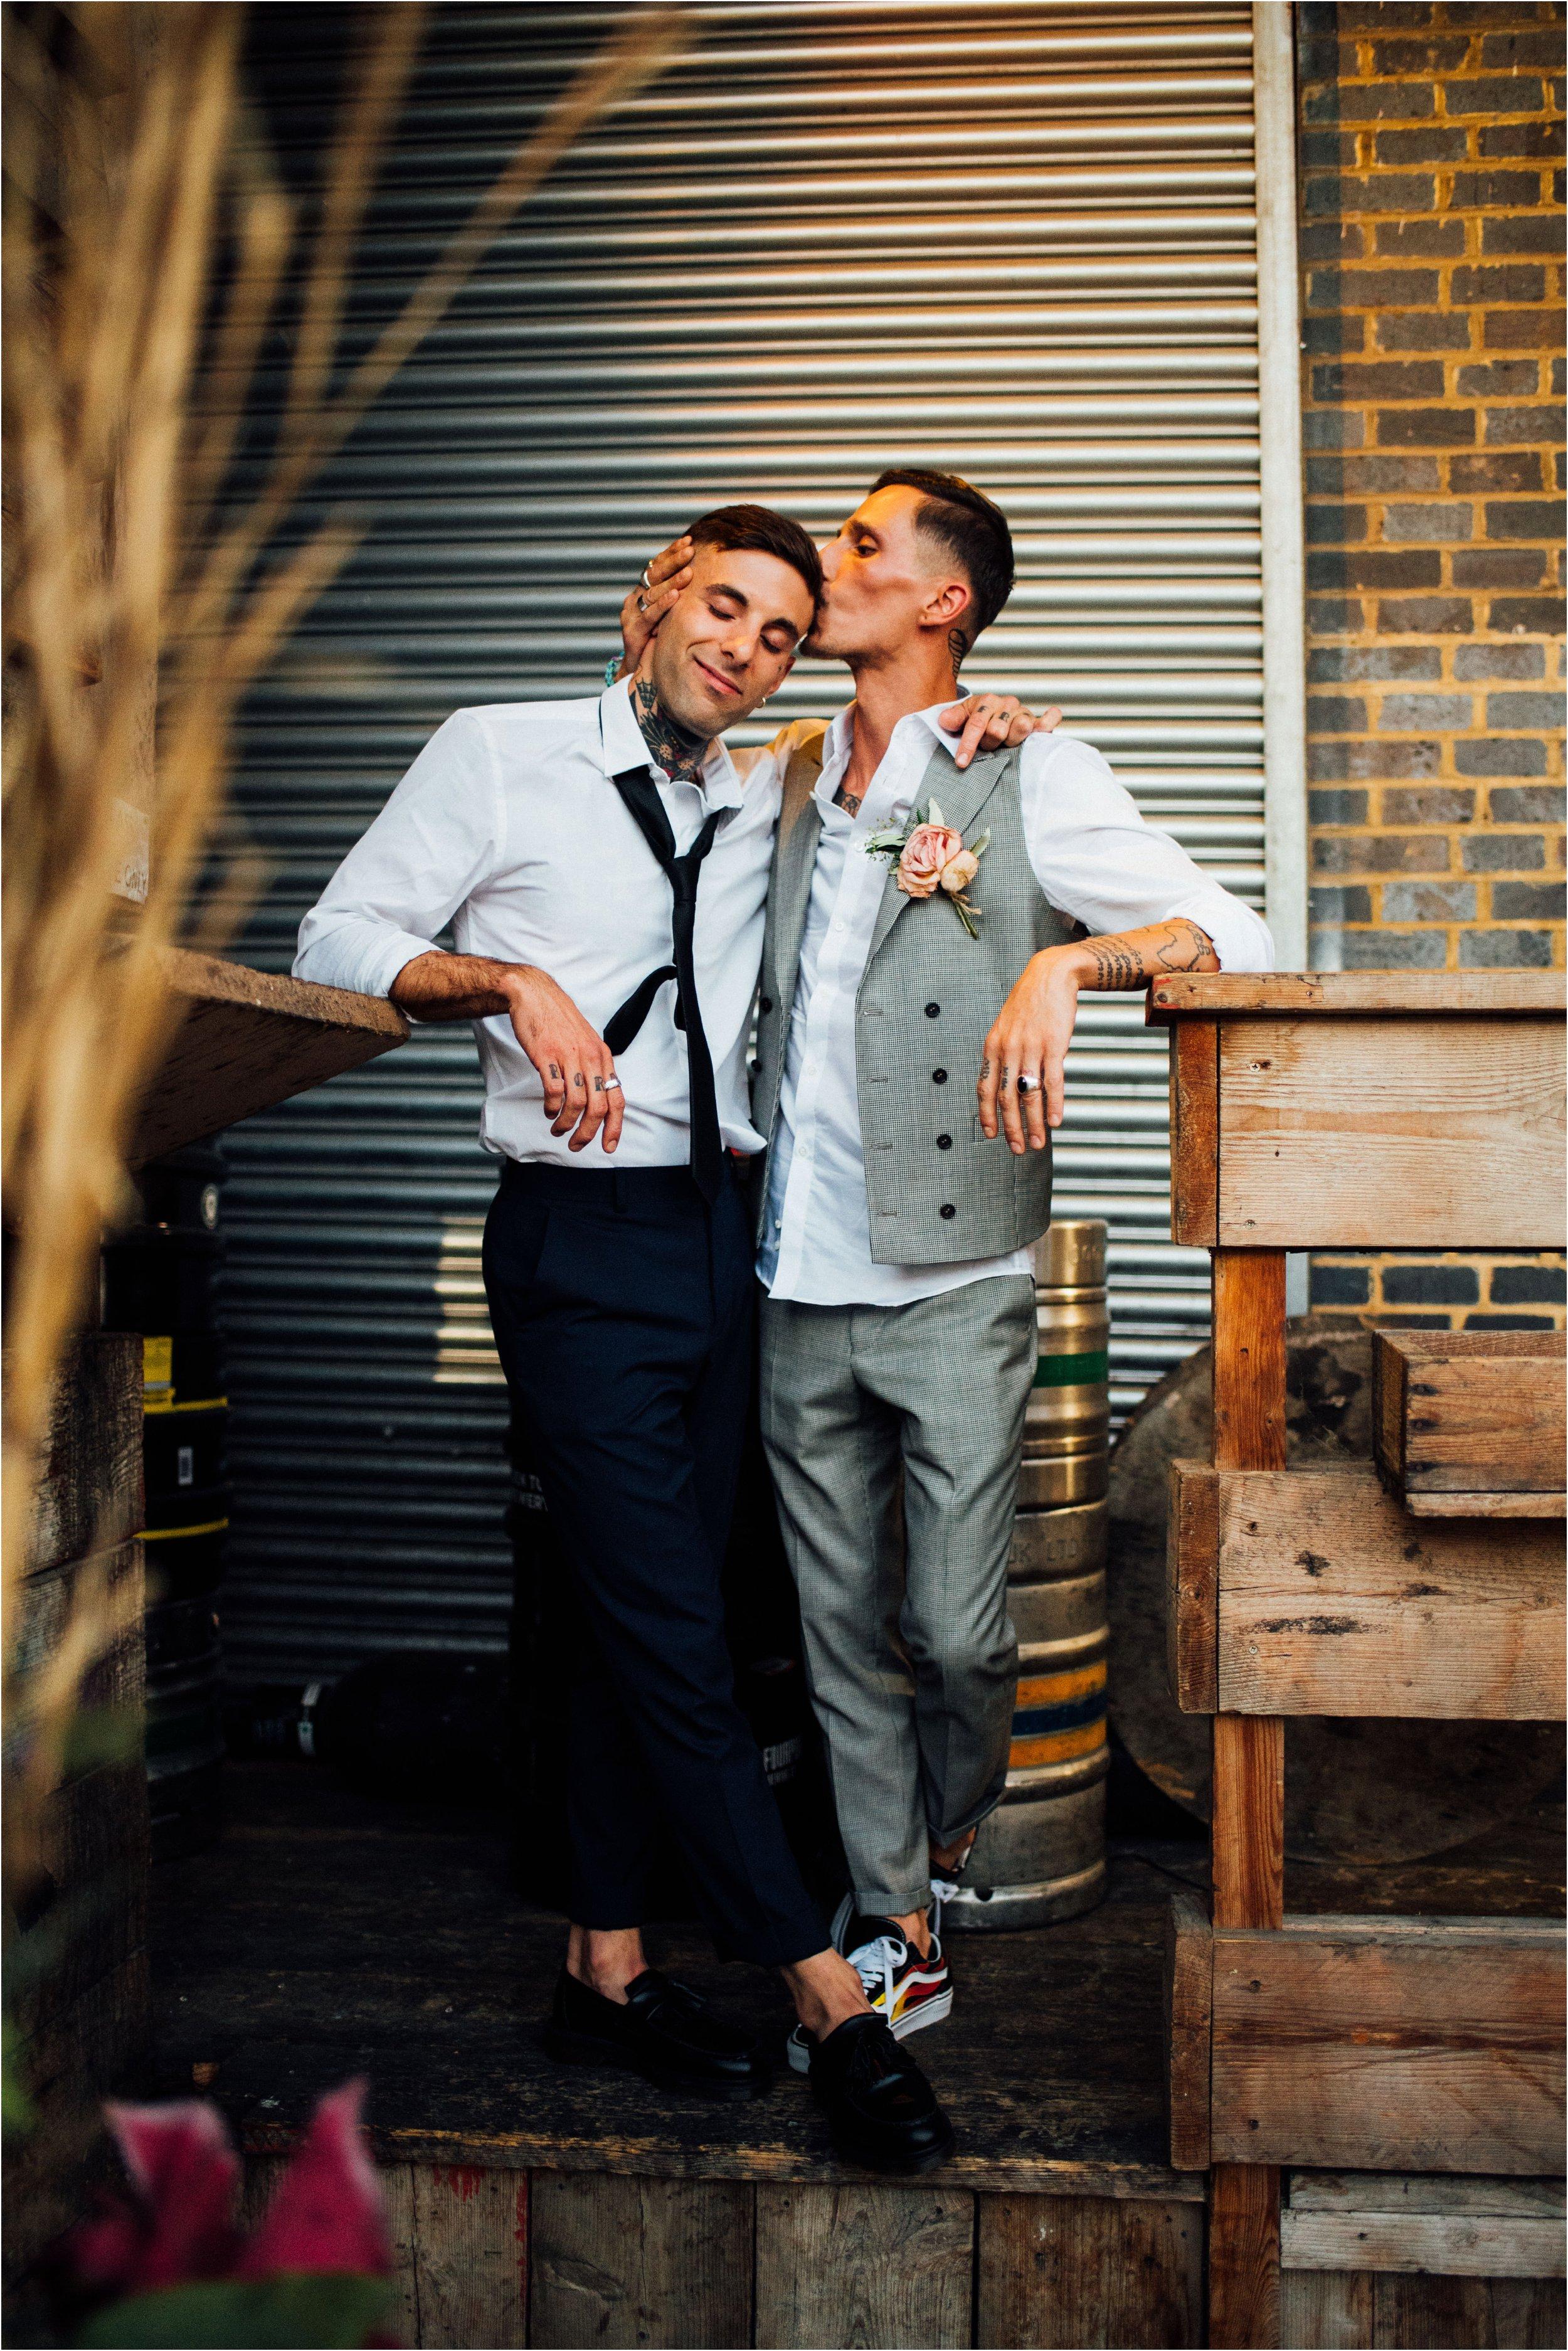 Hackney town hall wedding photography_0240.jpg